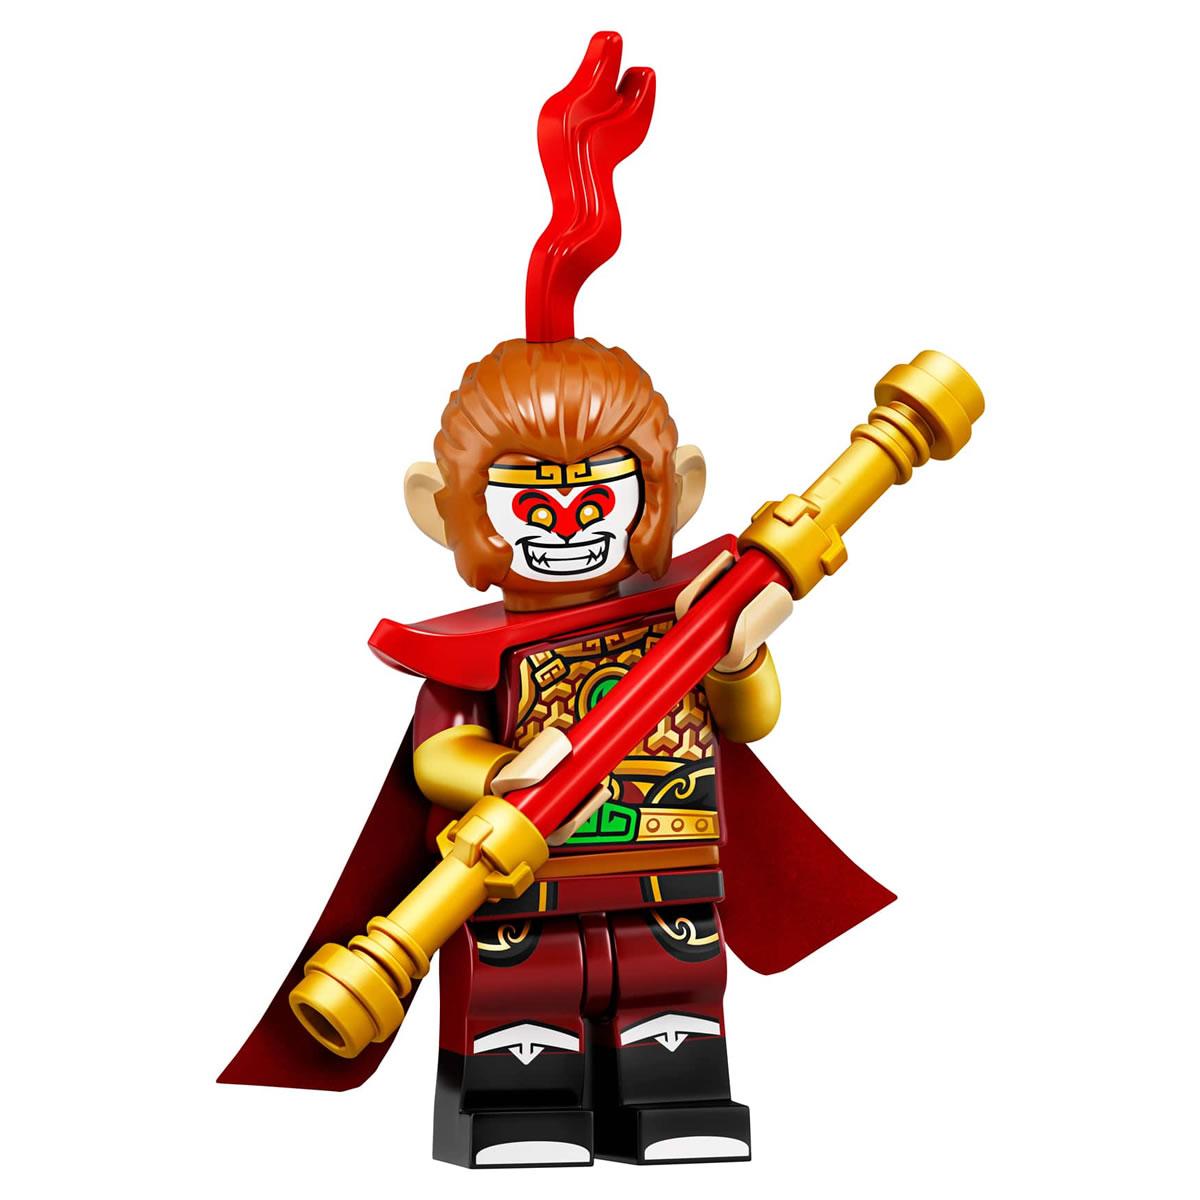 lego-minifiguren-sammelserie-collectible-minifigures-serie-19-71025-2019-4 zusammengebaut.com